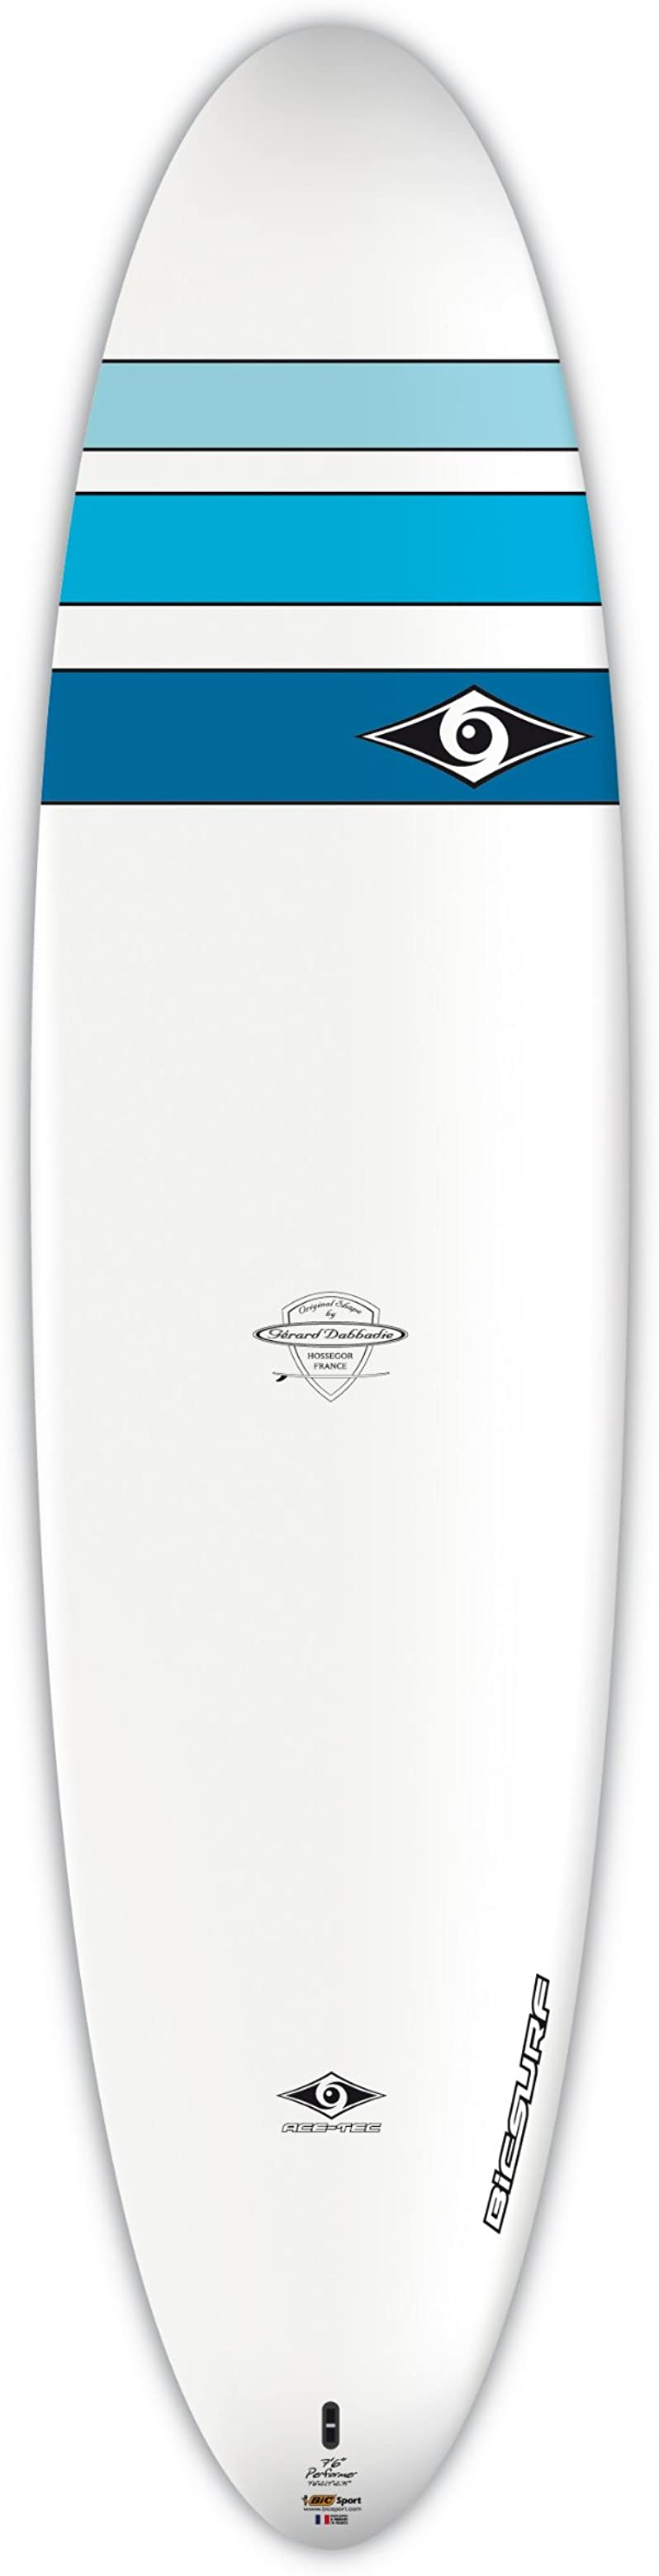 Tavola da surf performer 7`6``  bic 100228